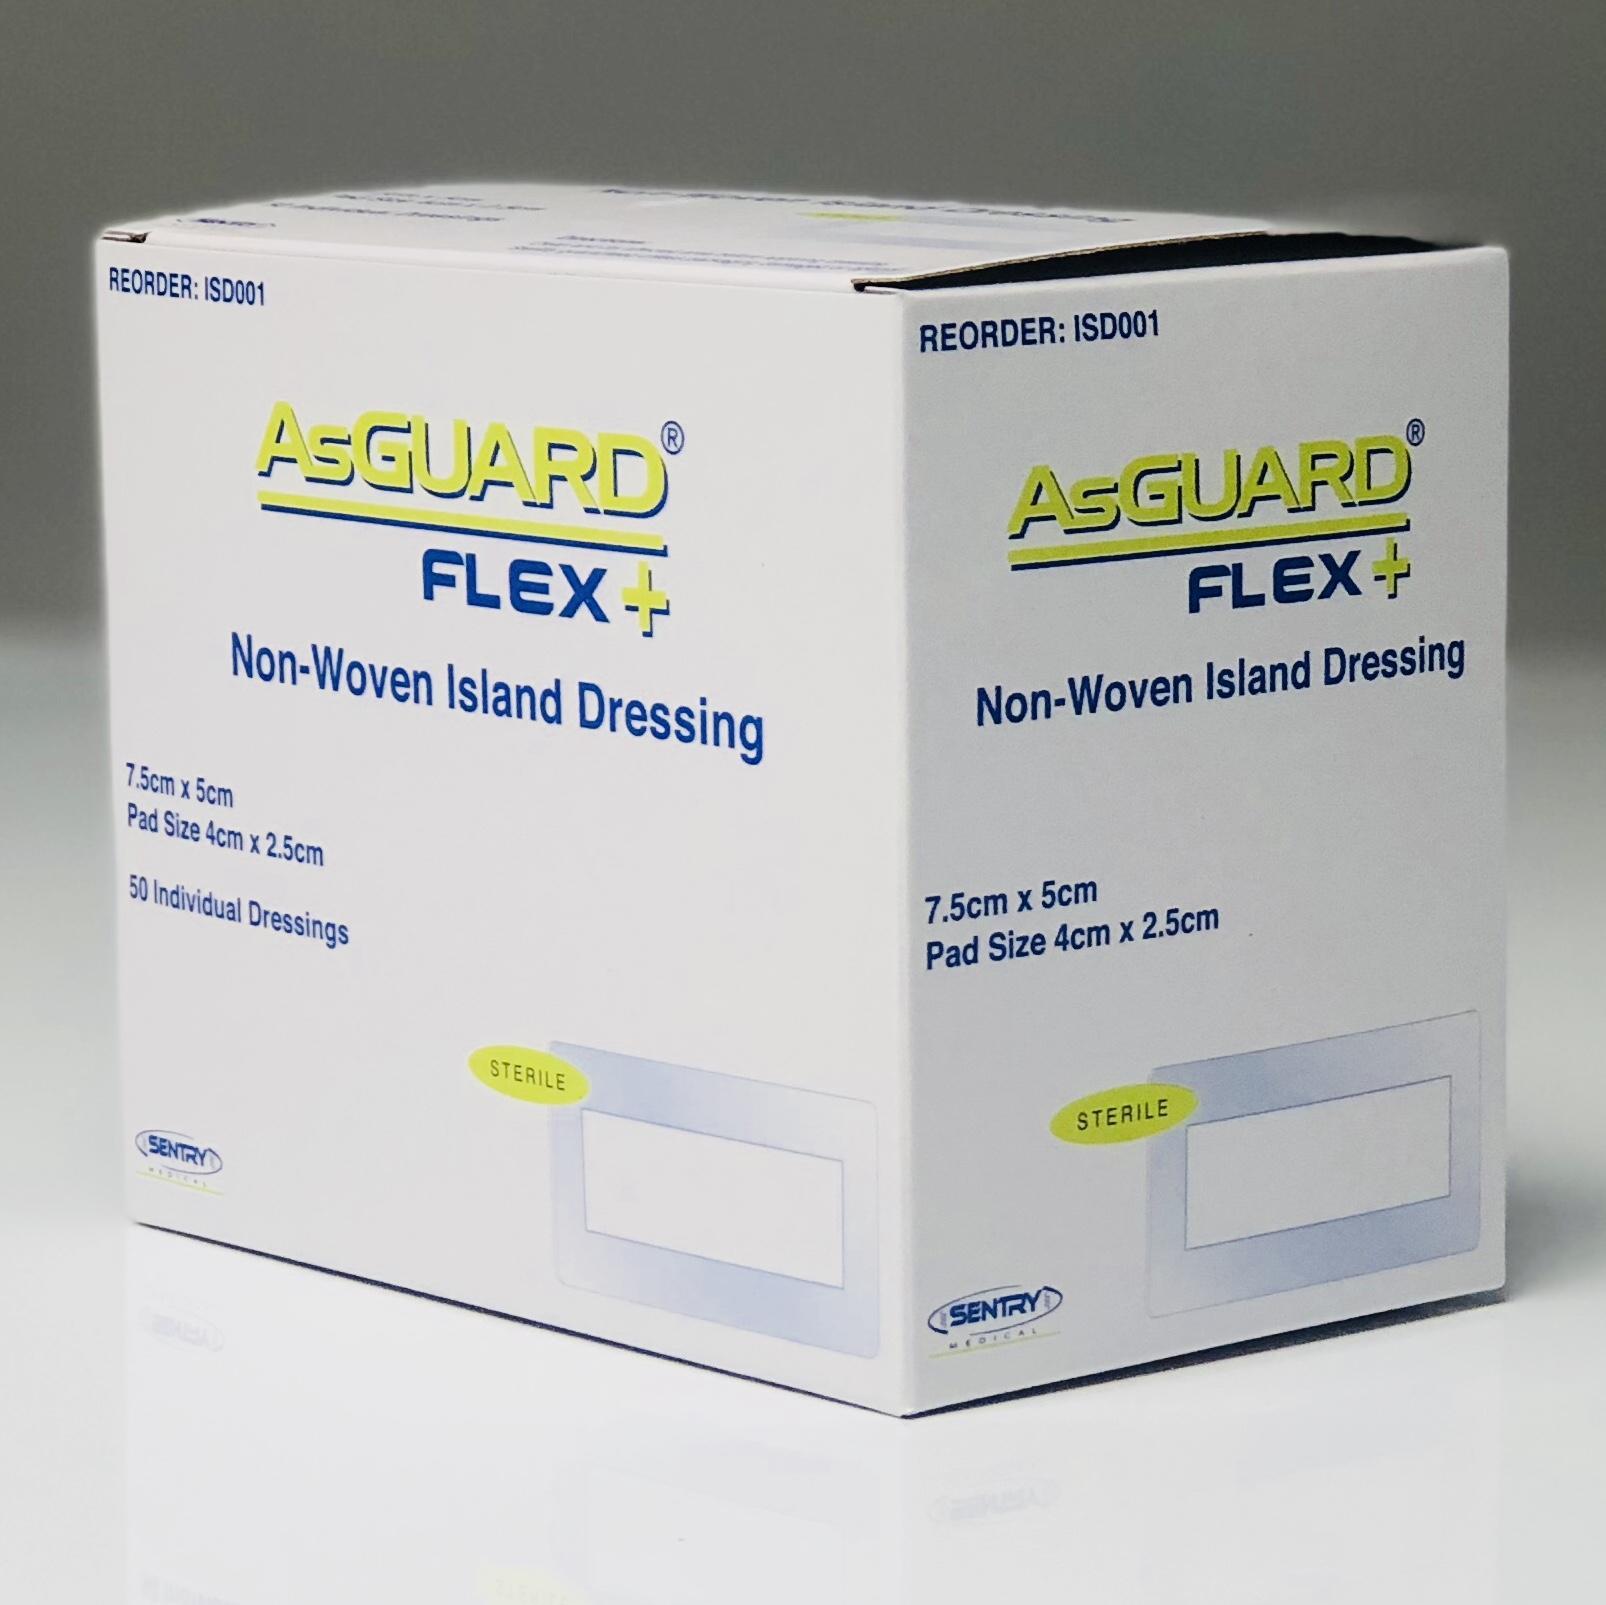 ASGUARD FLEX+ NON-WOVEN ISLAND DRESSING 5CMx7.5CM BOX 50